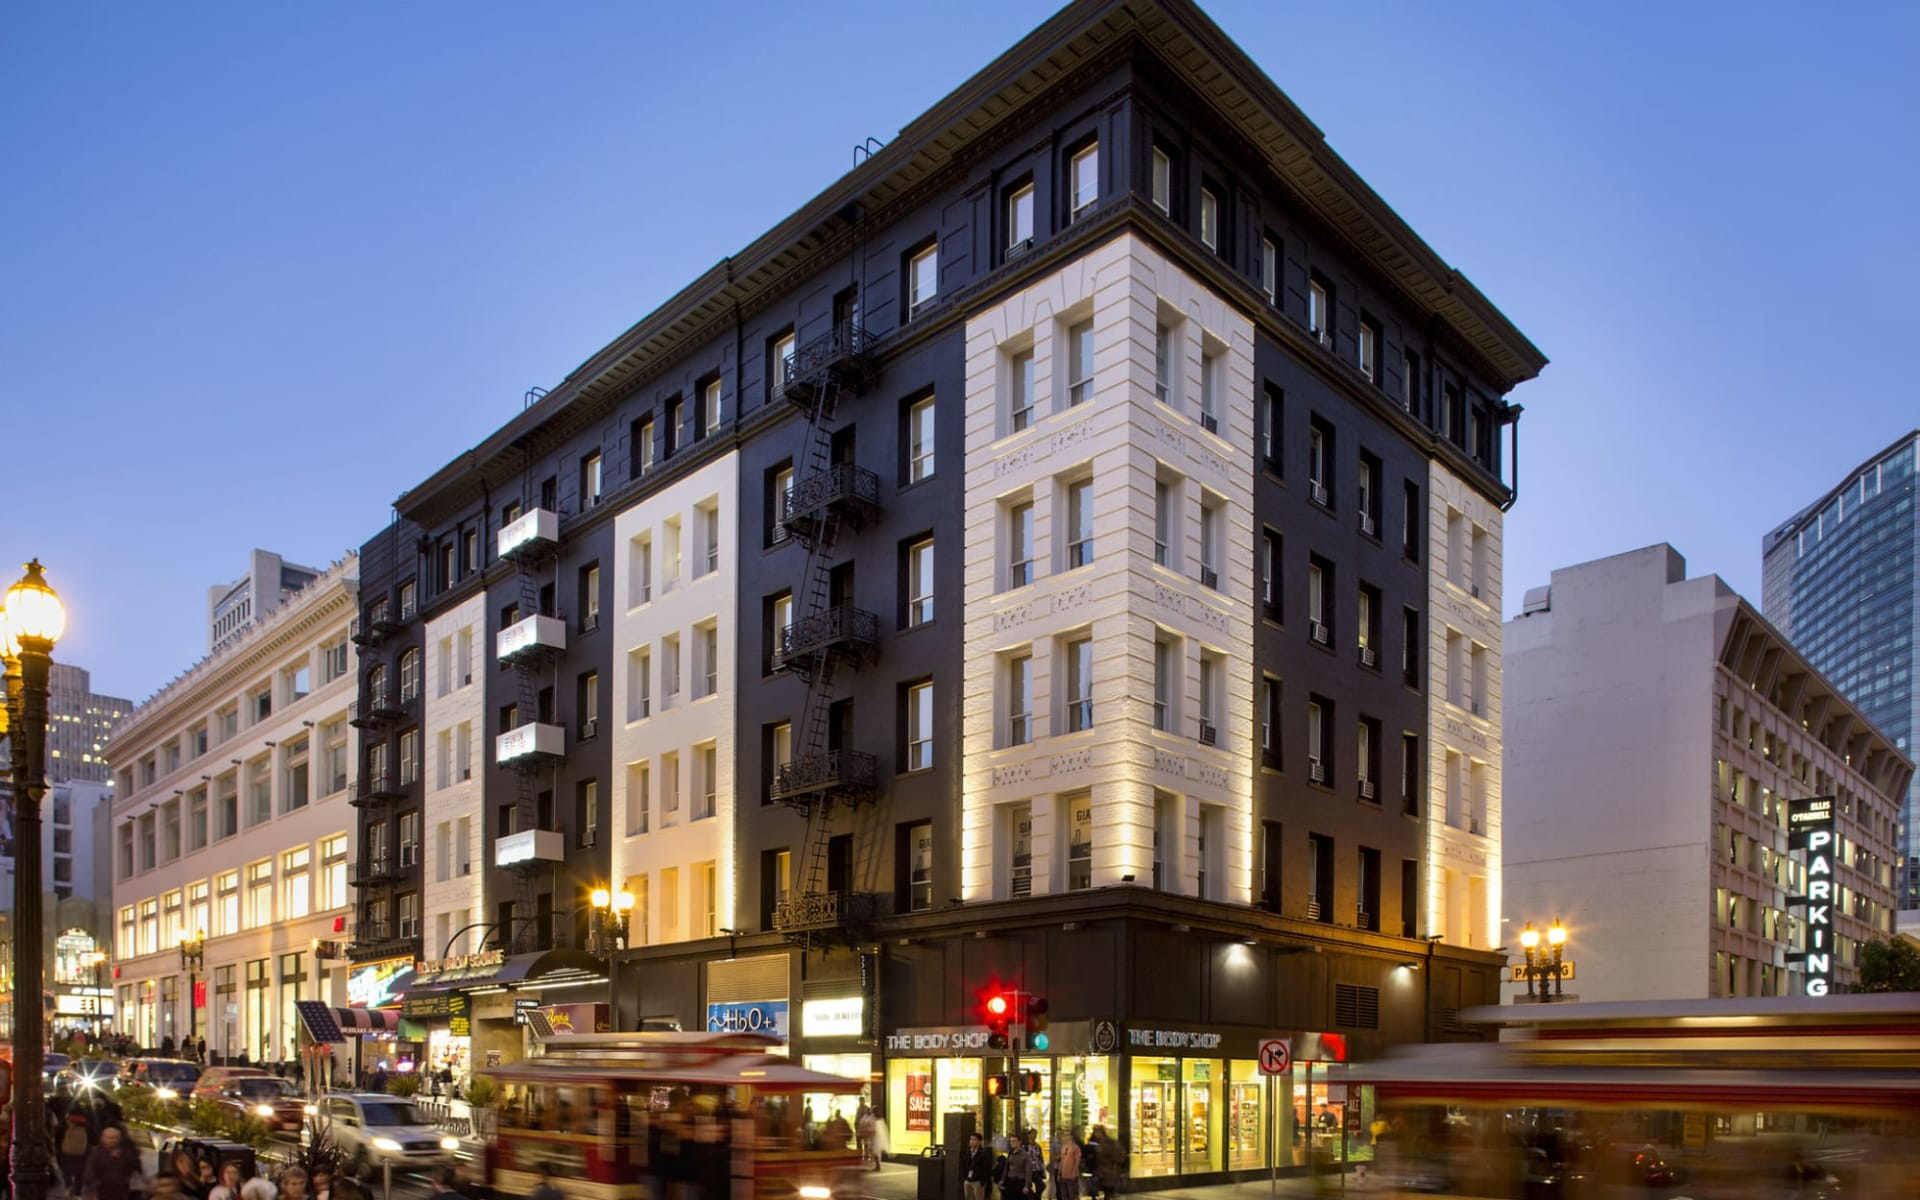 Hotel Union Square in San Francisco: Exterior_Hotel Union Square_Aussenansicht_ATI